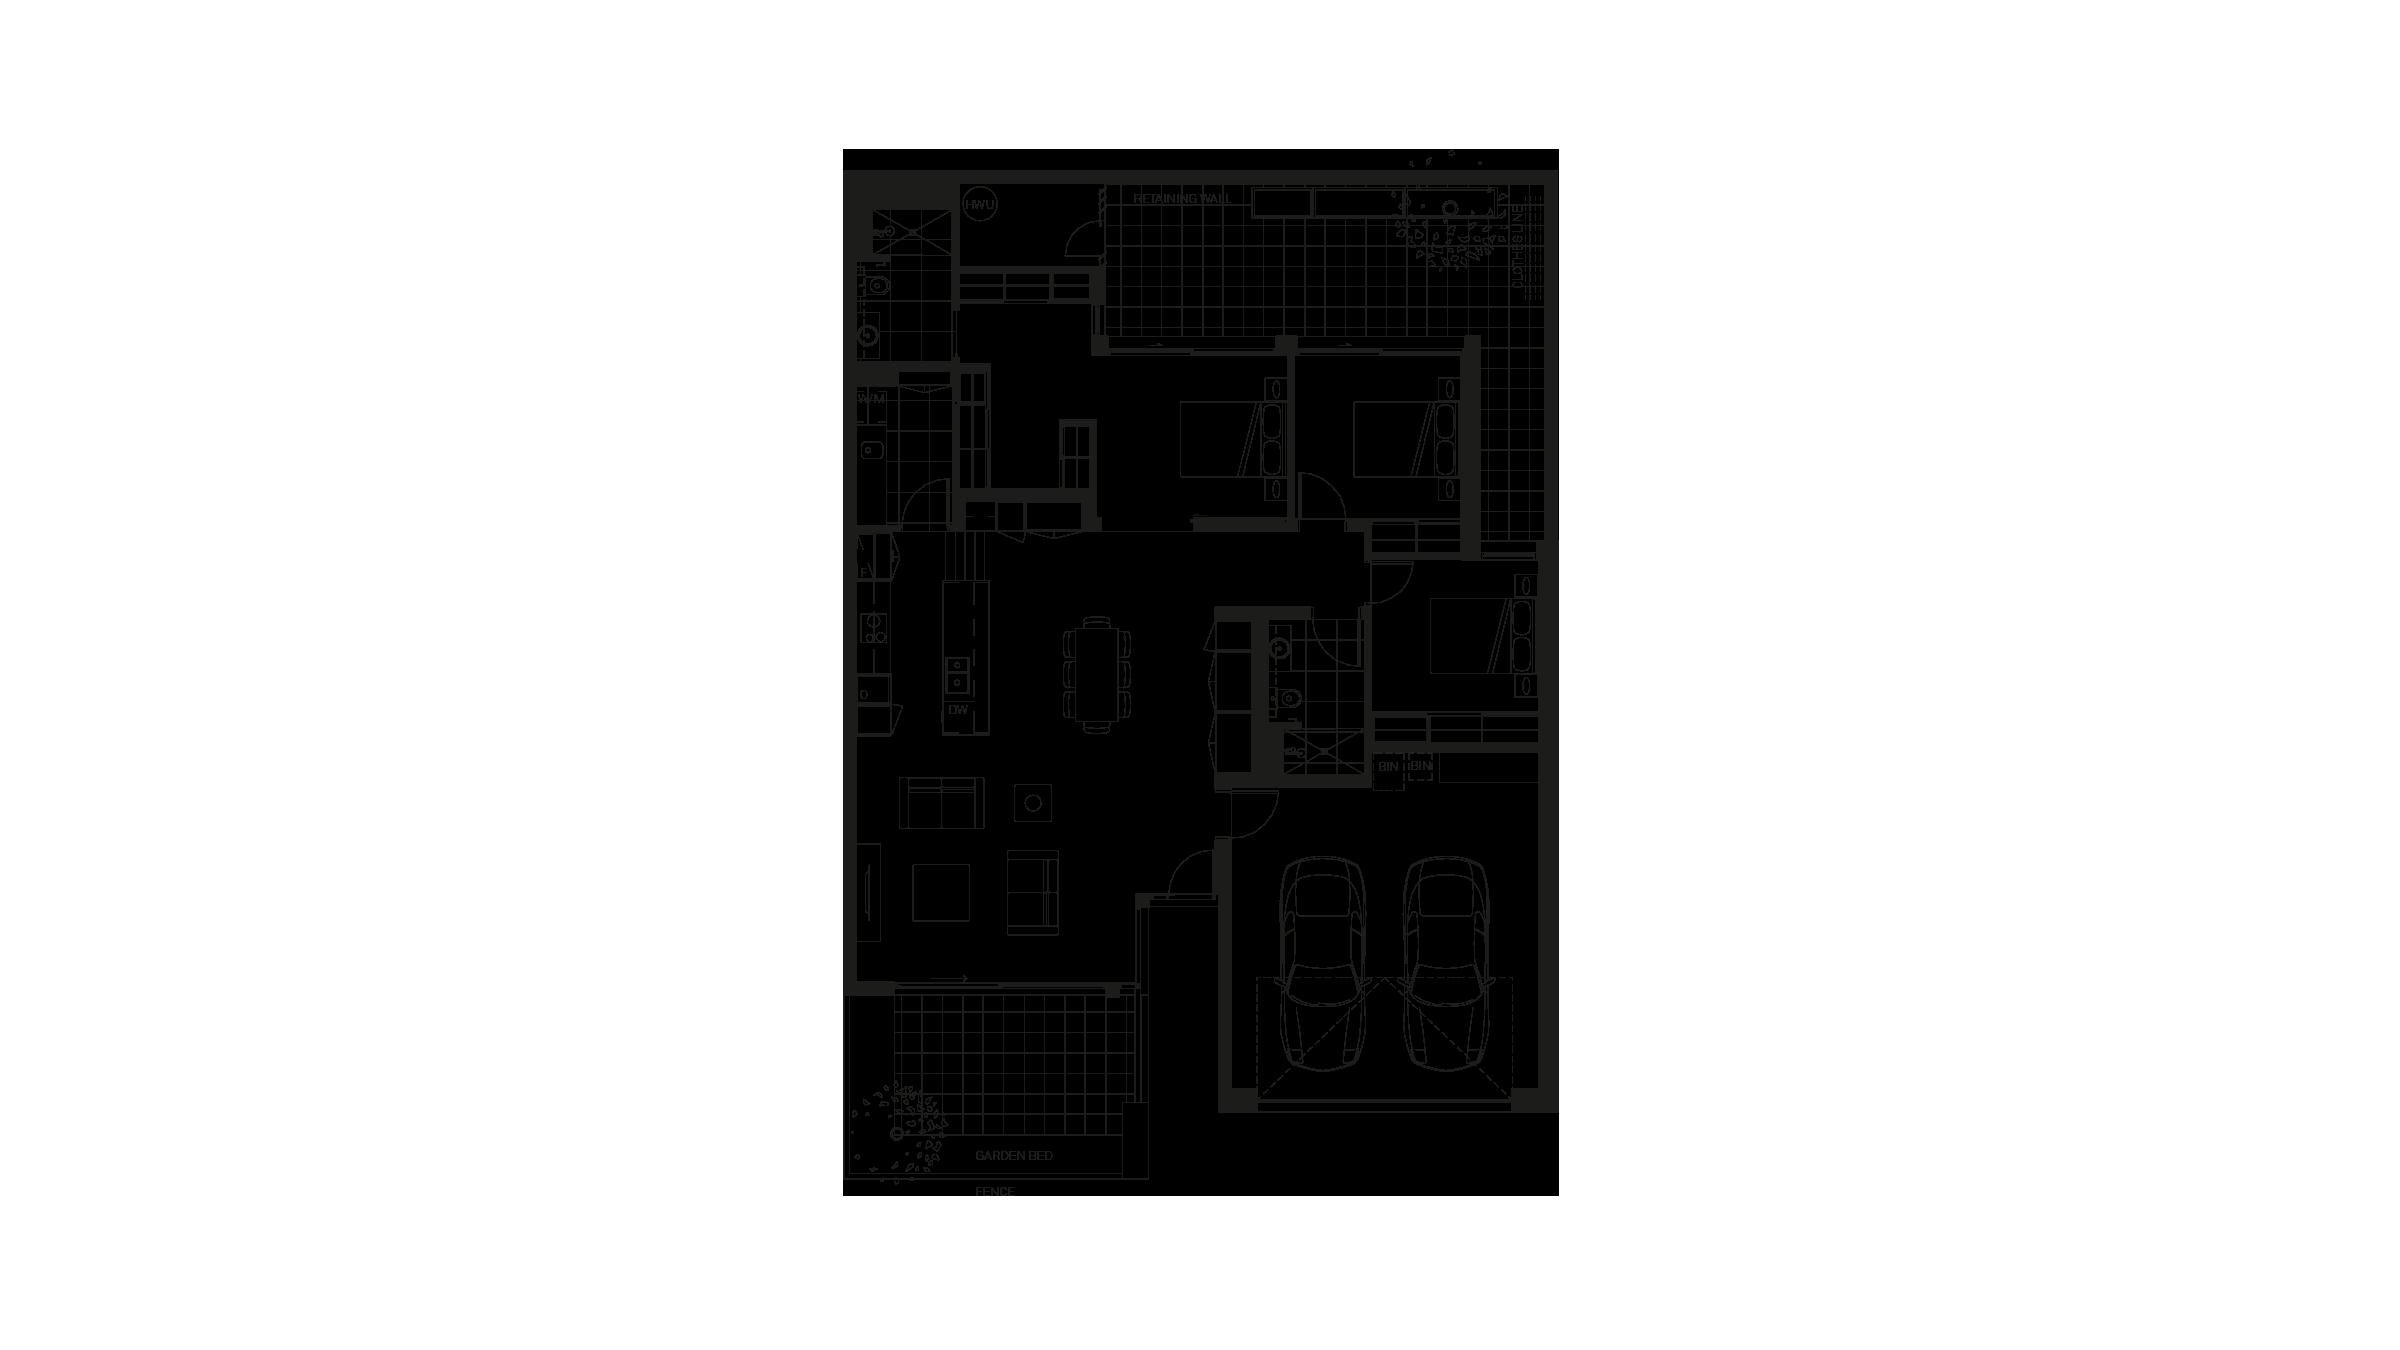 Baptcare, The Orchards – unit 38 floor plan